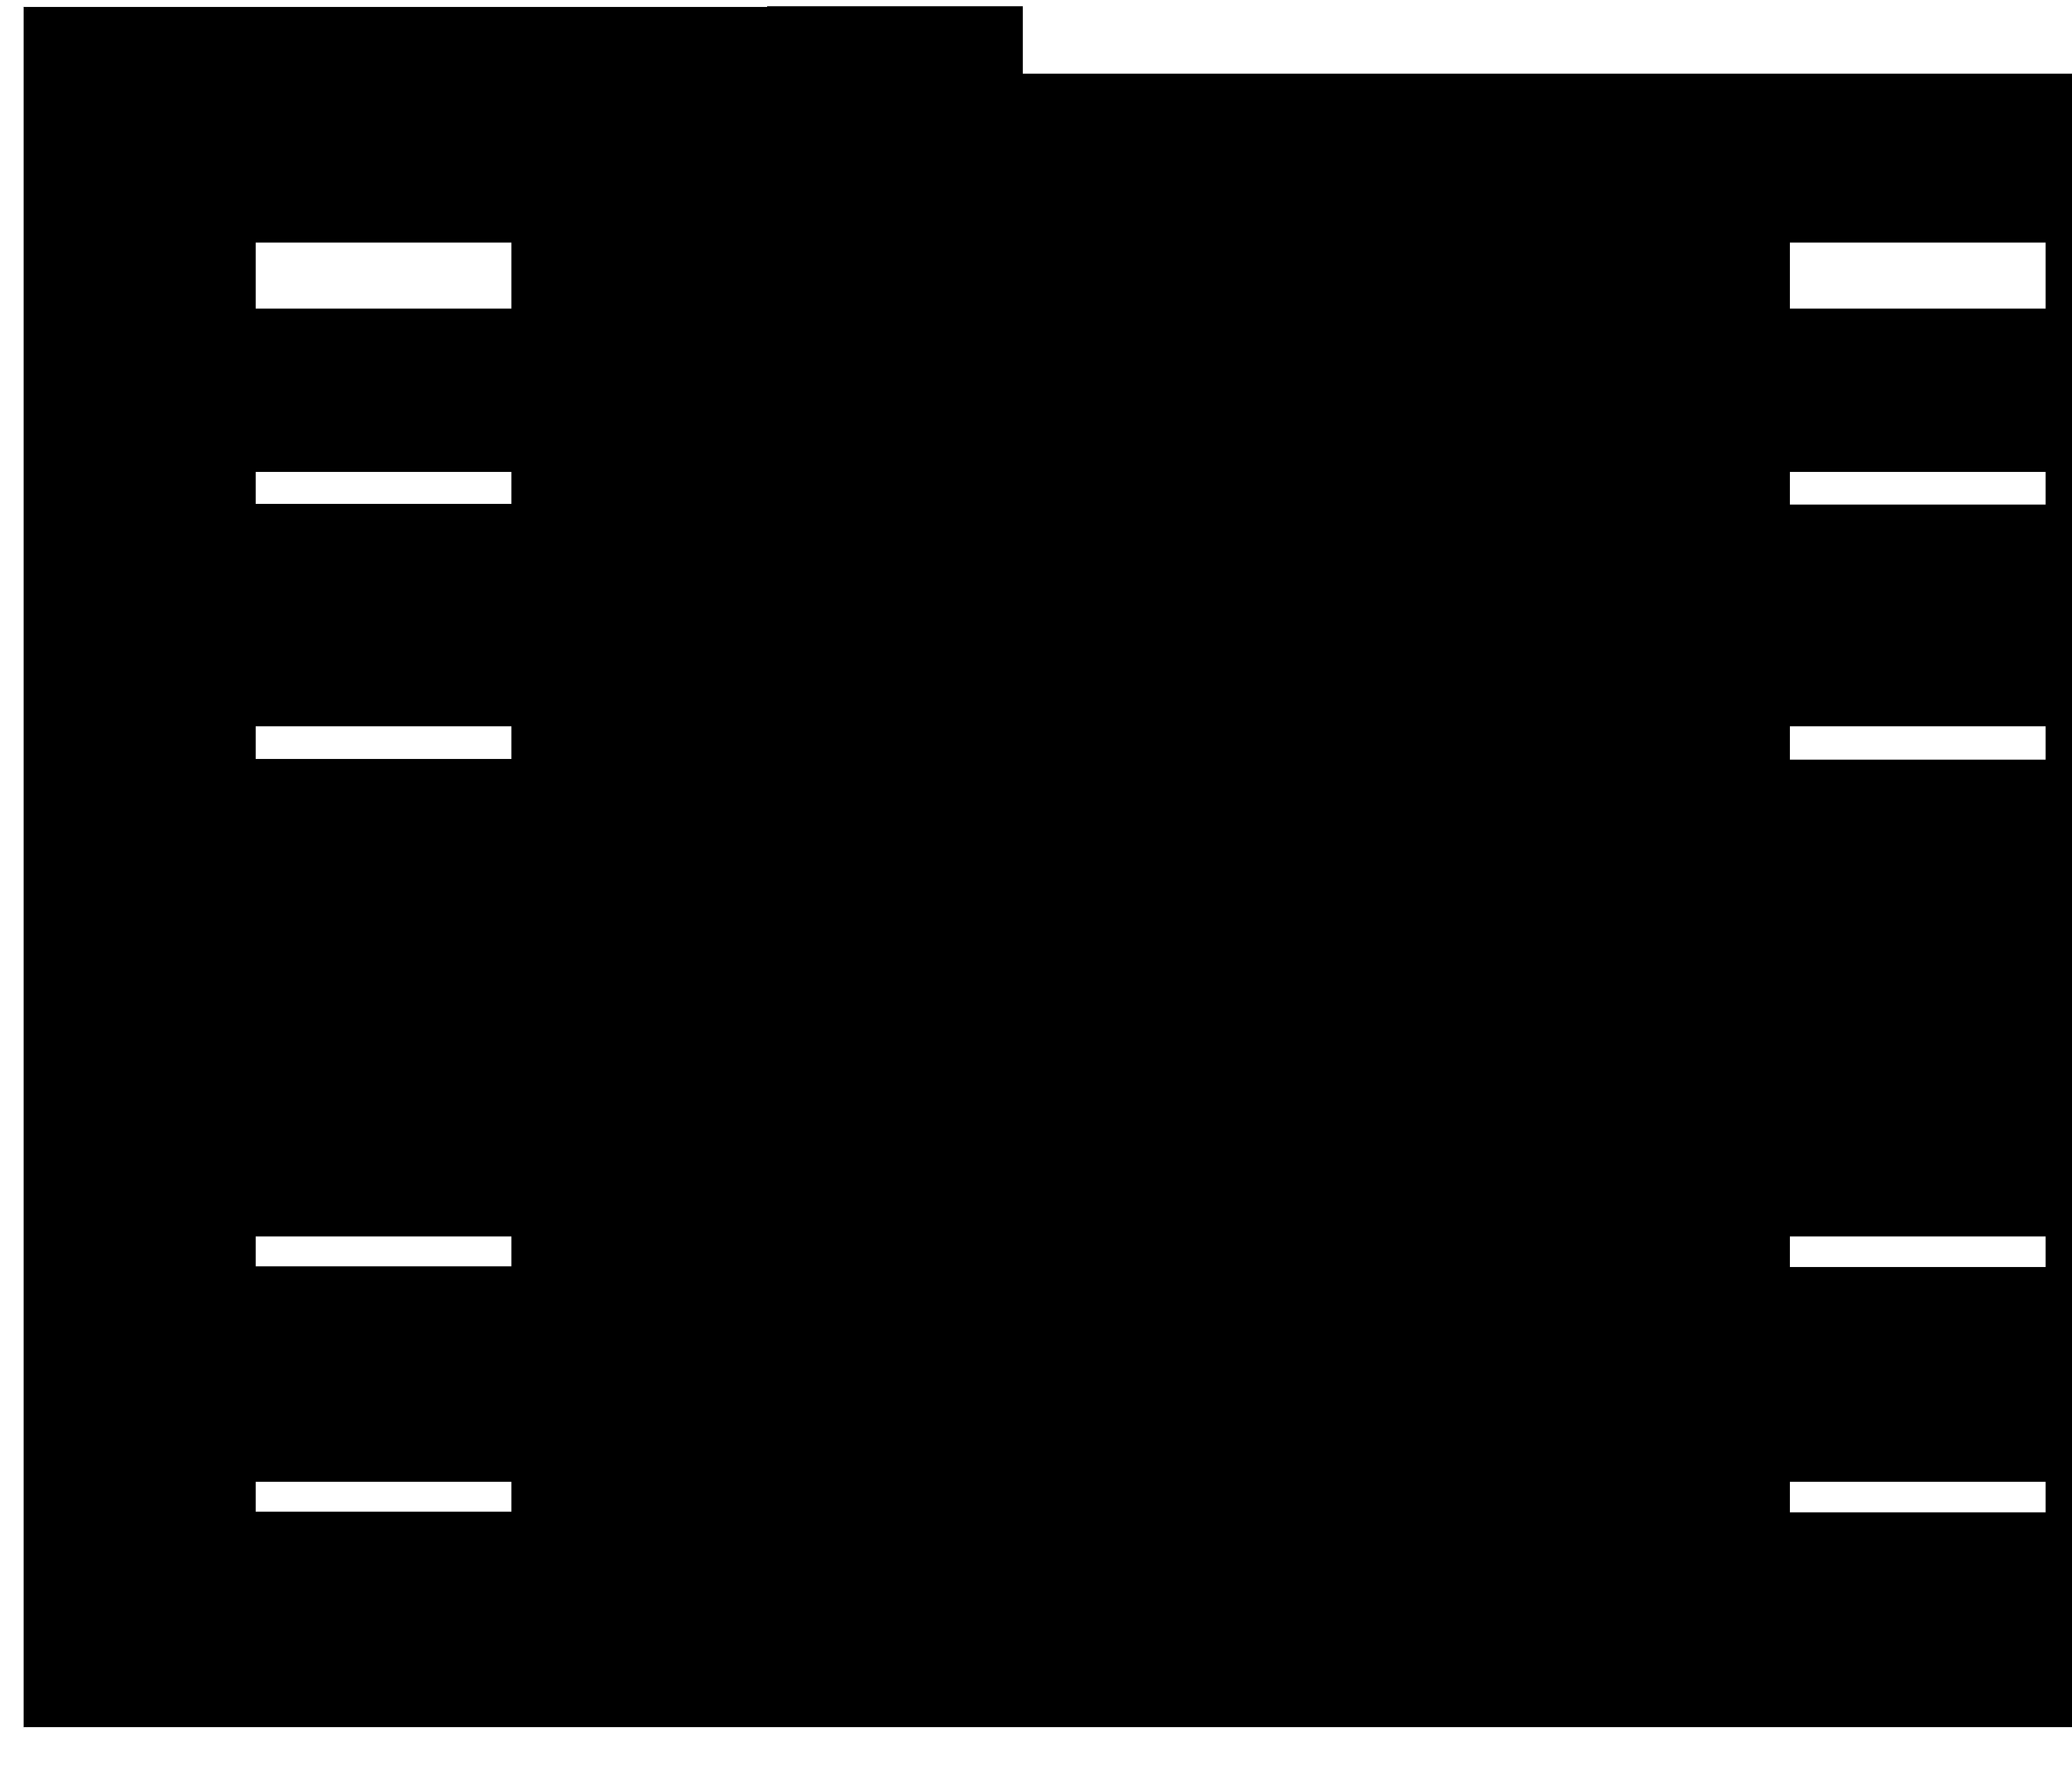 karsilastirma-tablosu-3